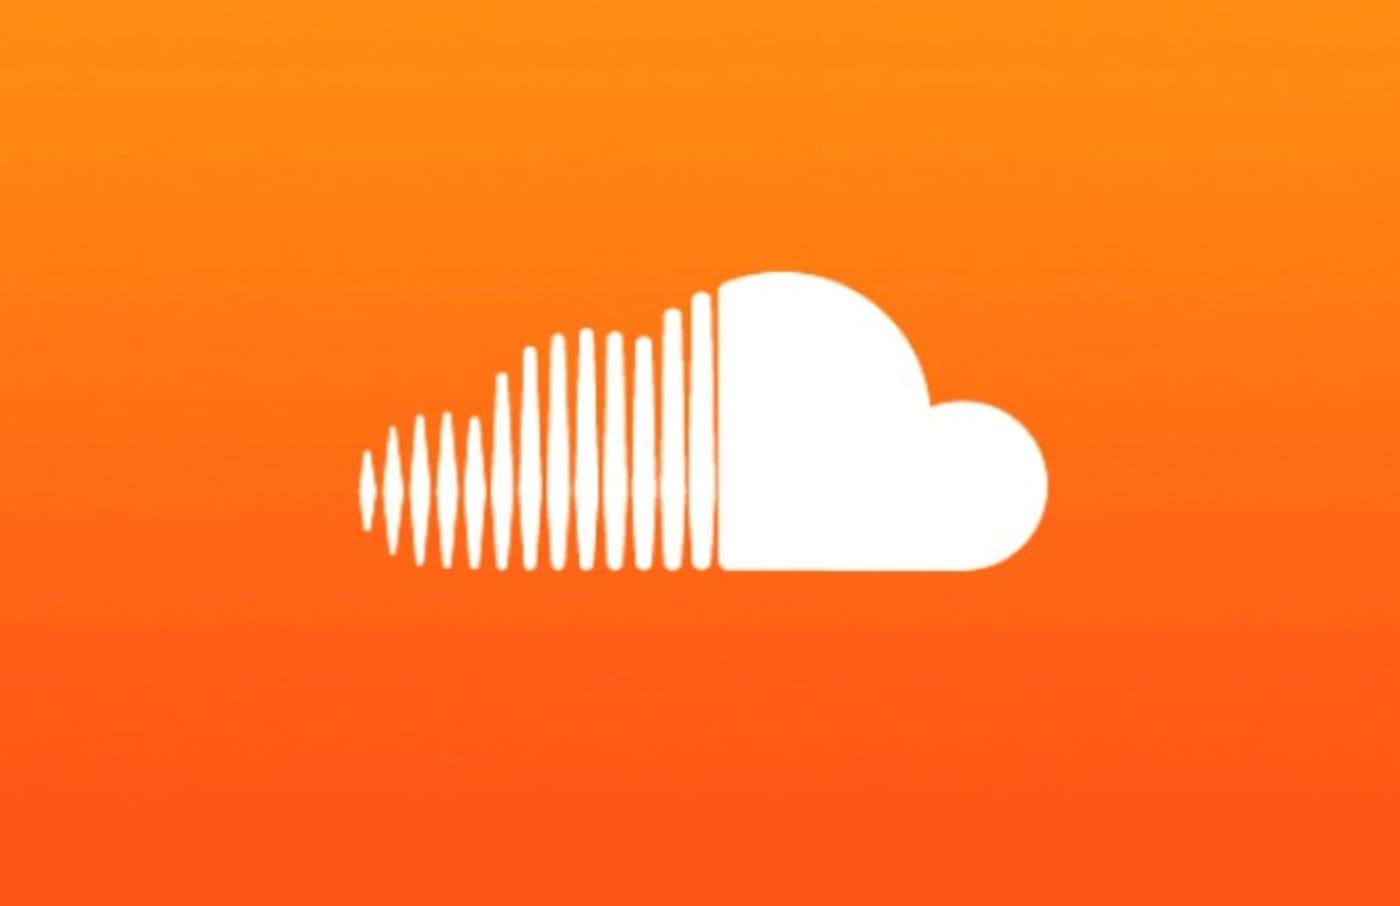 soundcloud logo white cloud orange backdrop